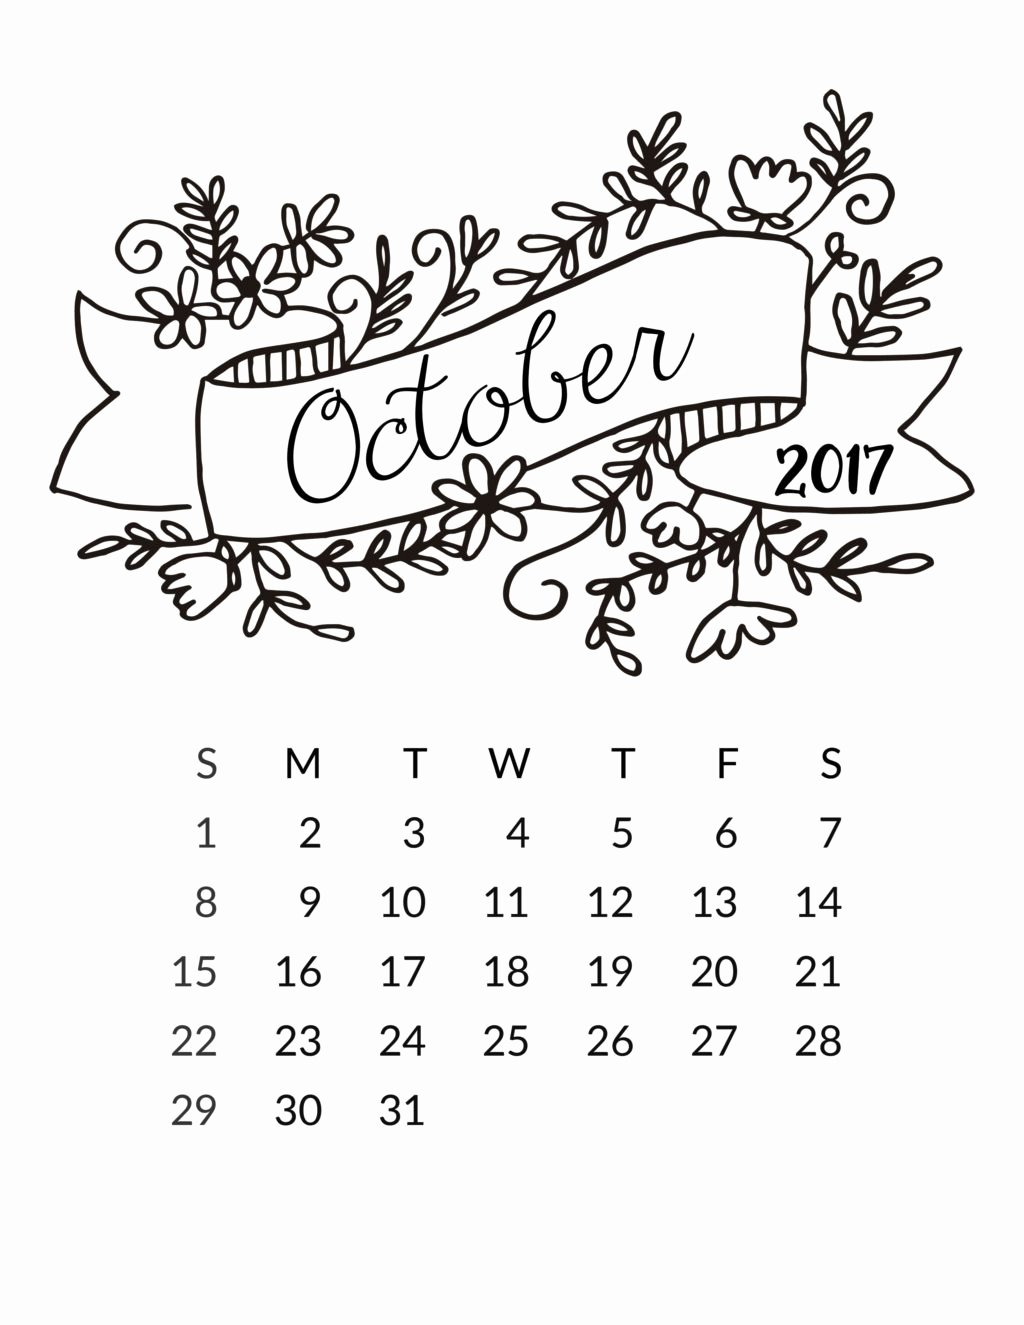 Time Worksheets for Preschoolers Awesome Worksheet Freerintables for Home Telling Time Worksheet